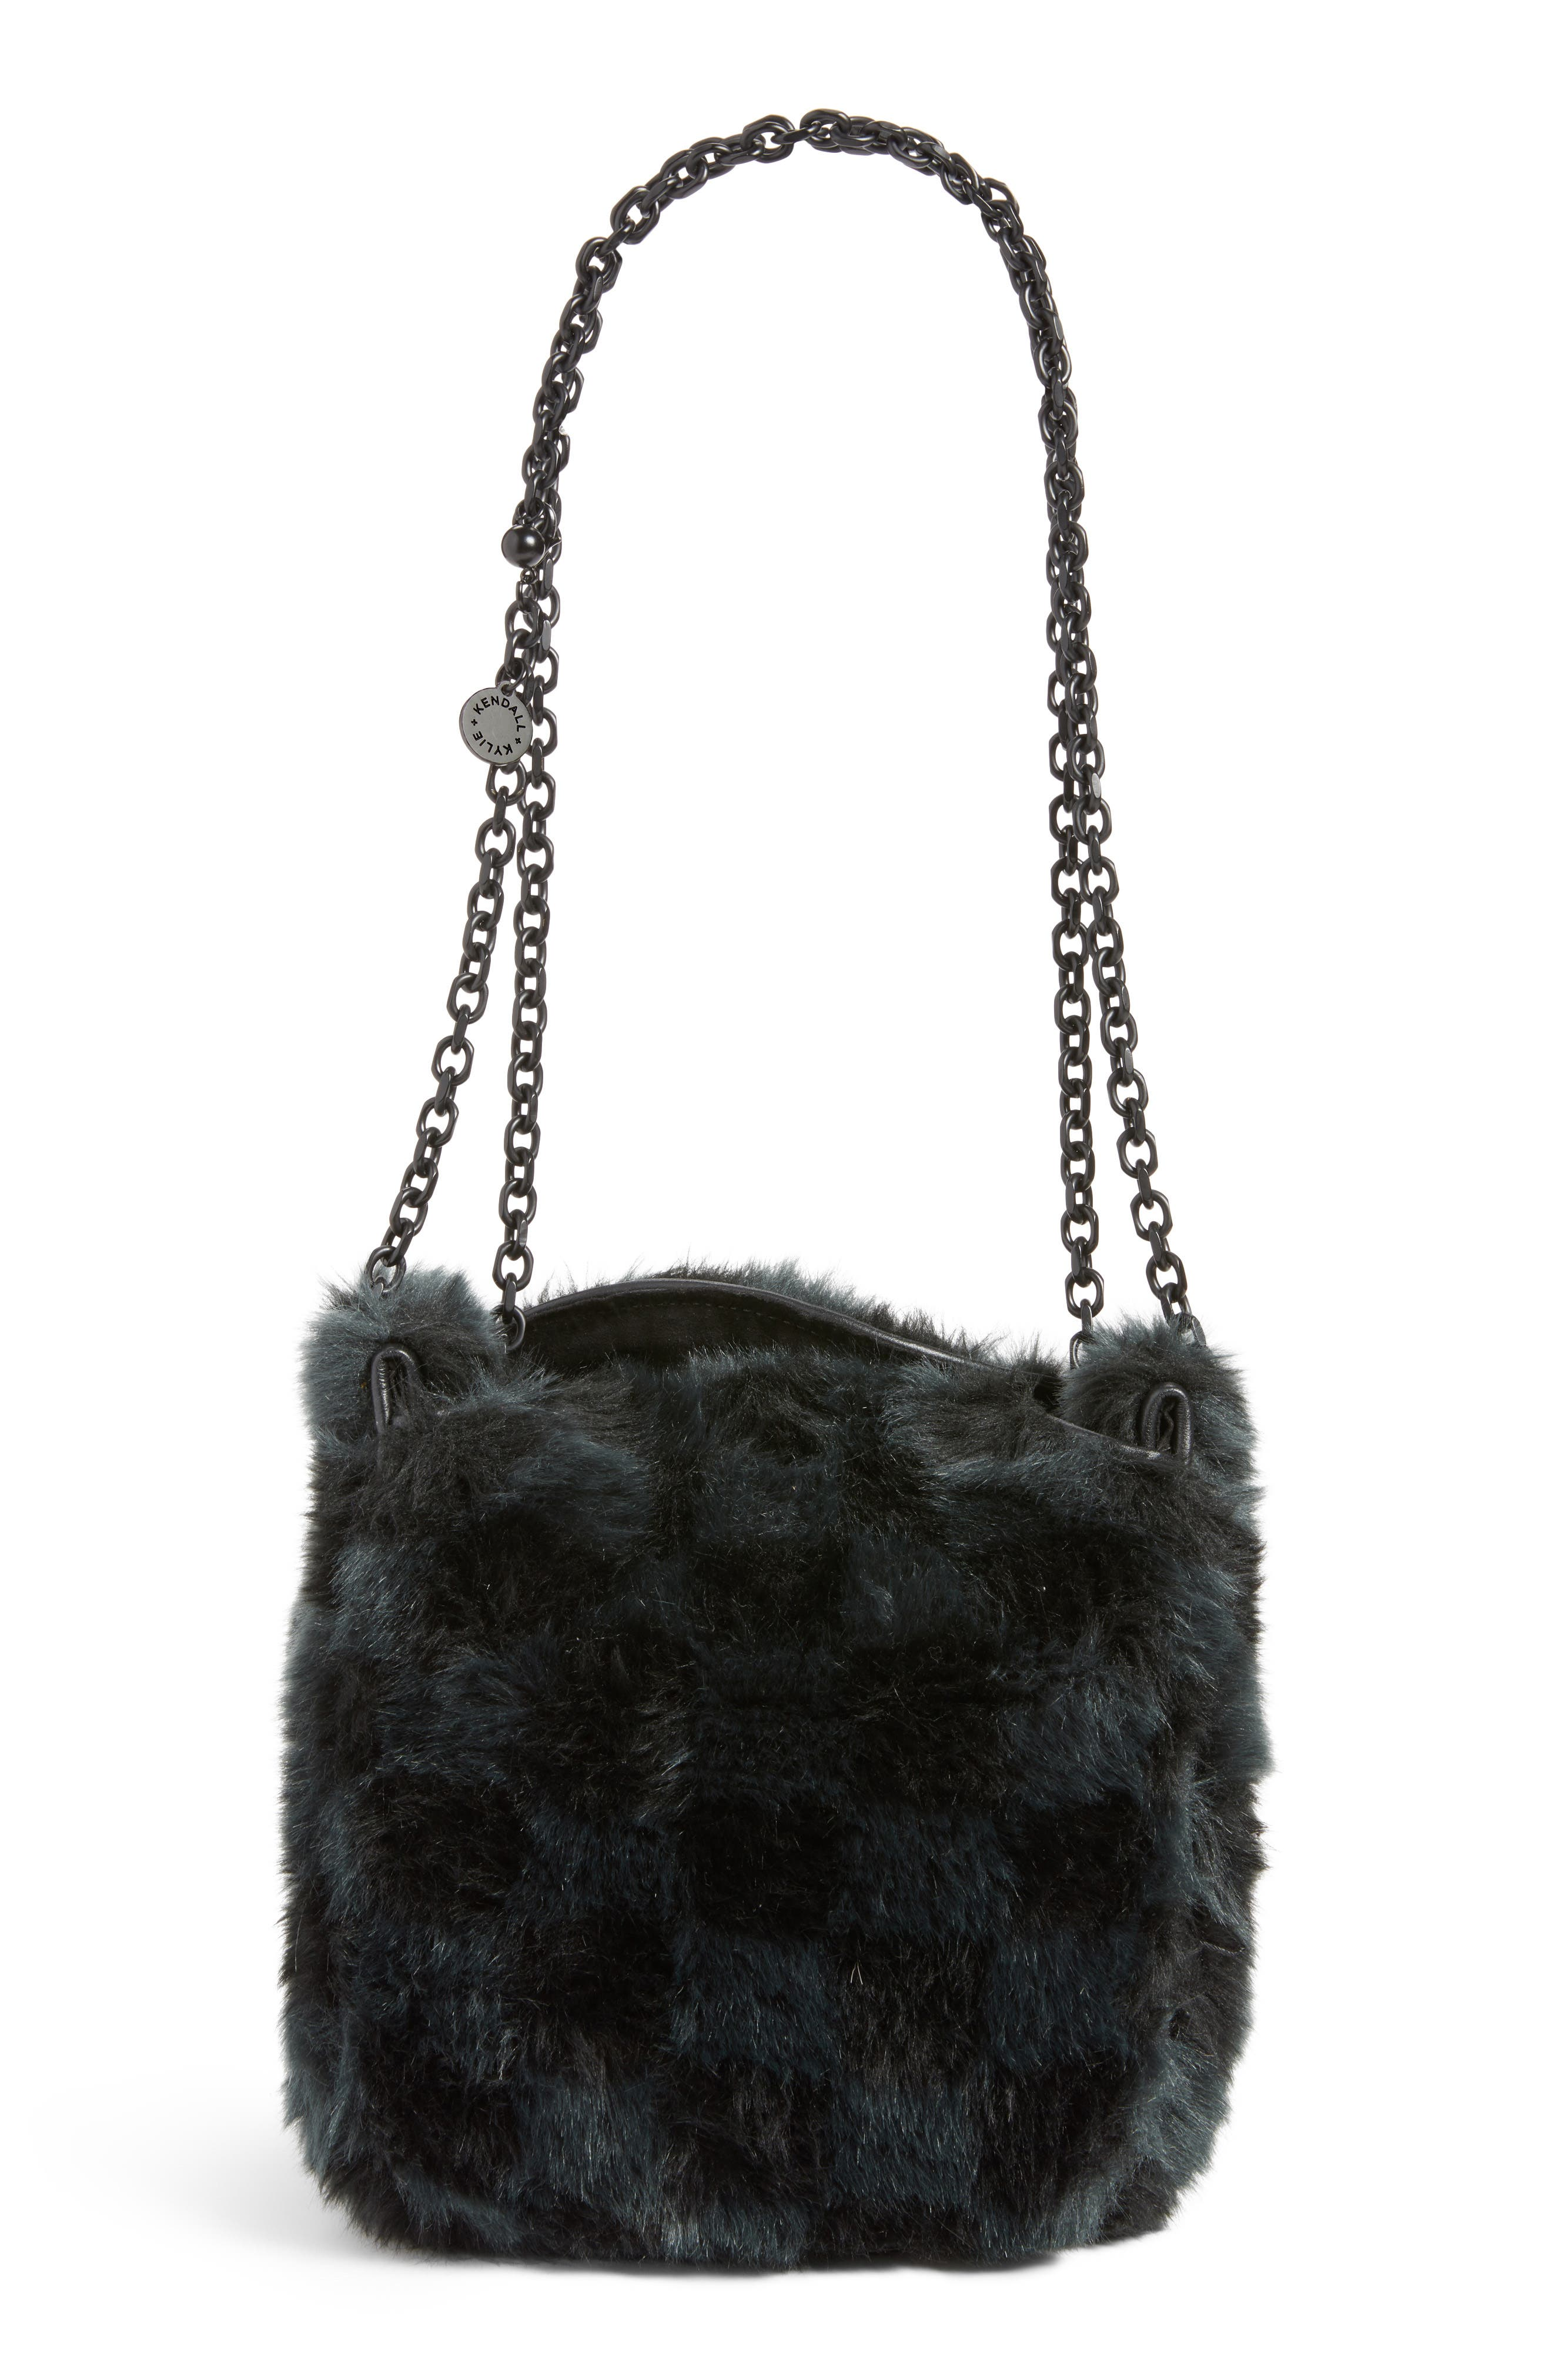 KENDALL + KYLIE Faux Fur Bucket Bag